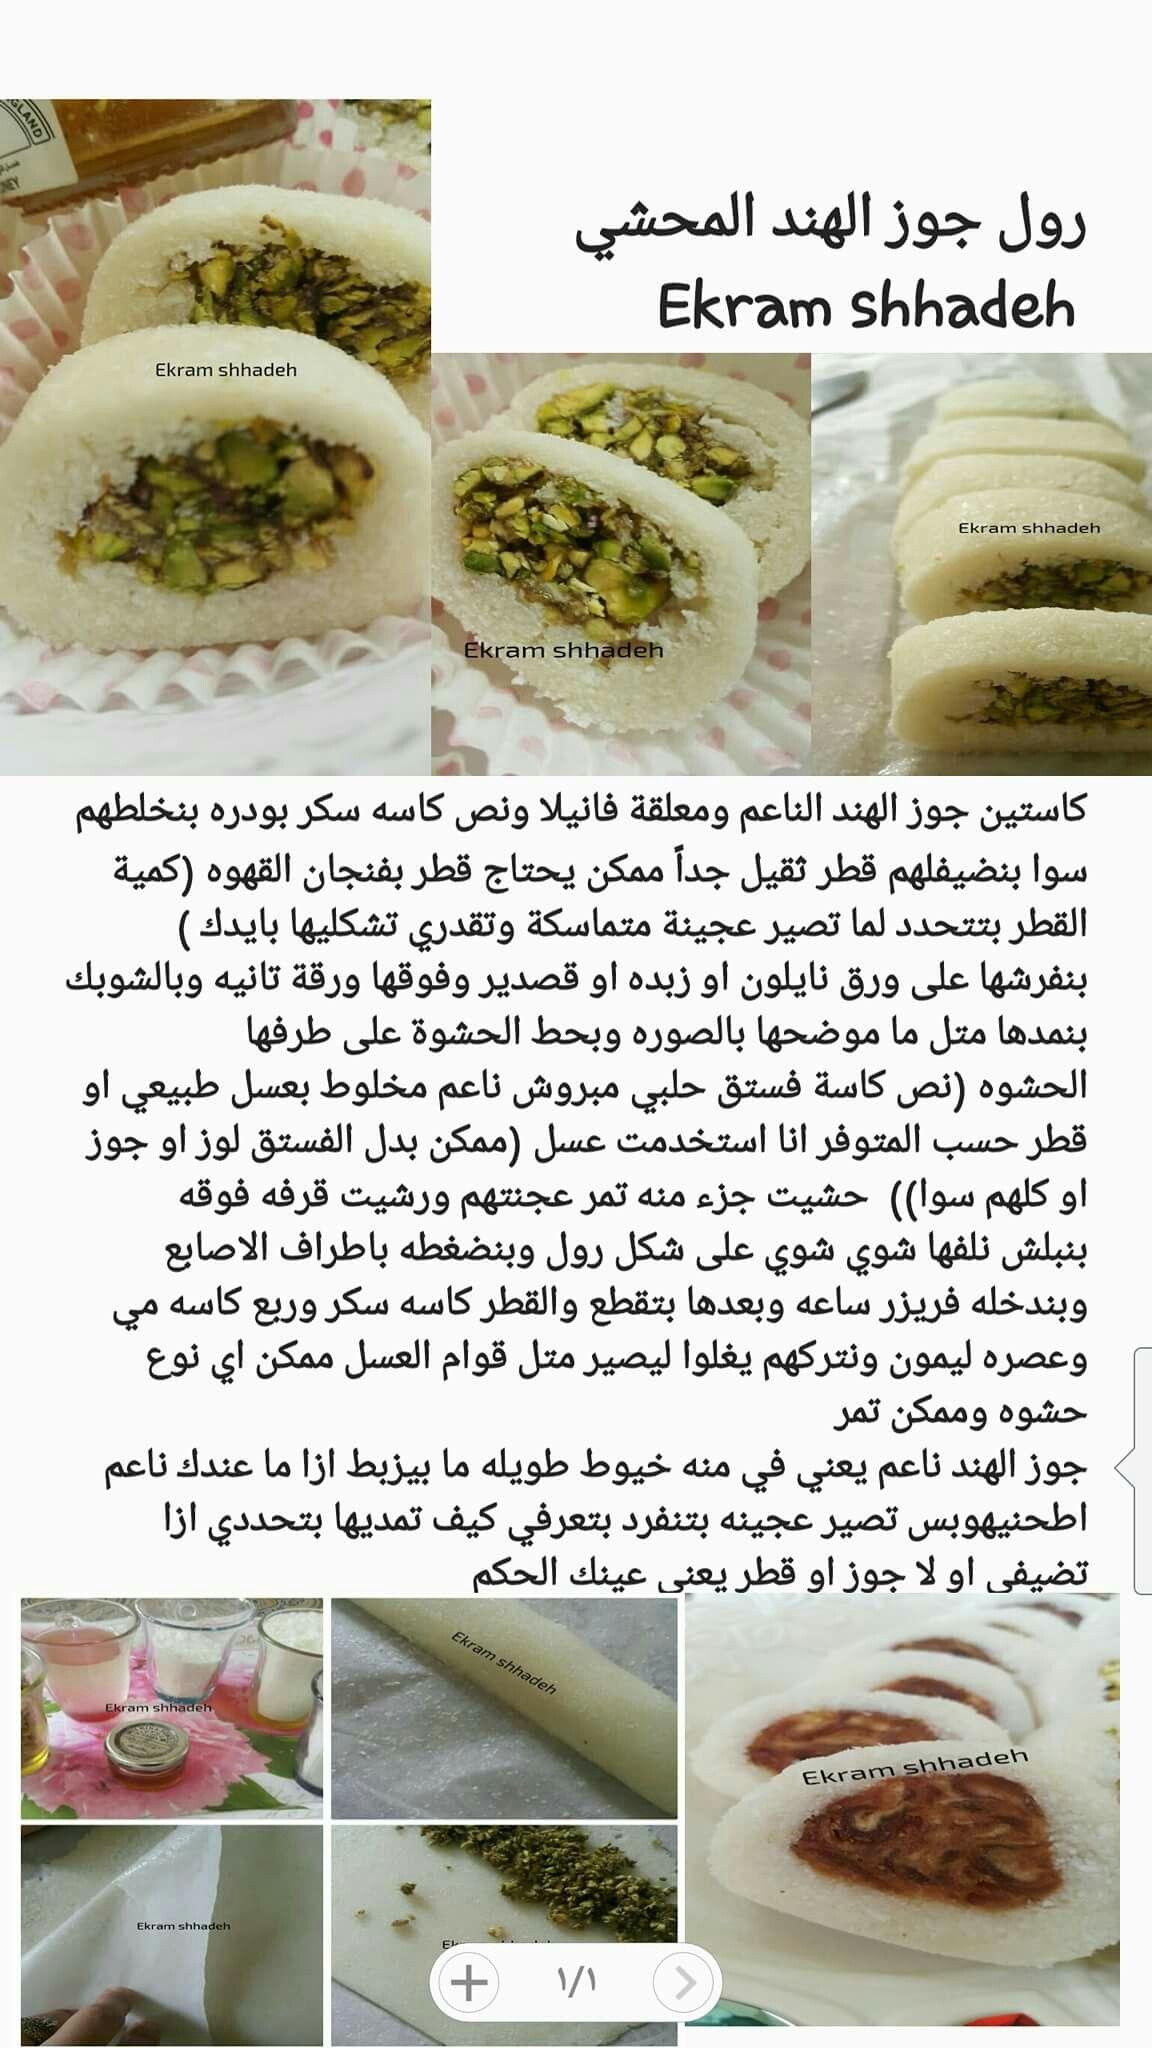 Pin by Najah Sabri on زاكي | Pinterest | Arabic food, Arabic sweets ...